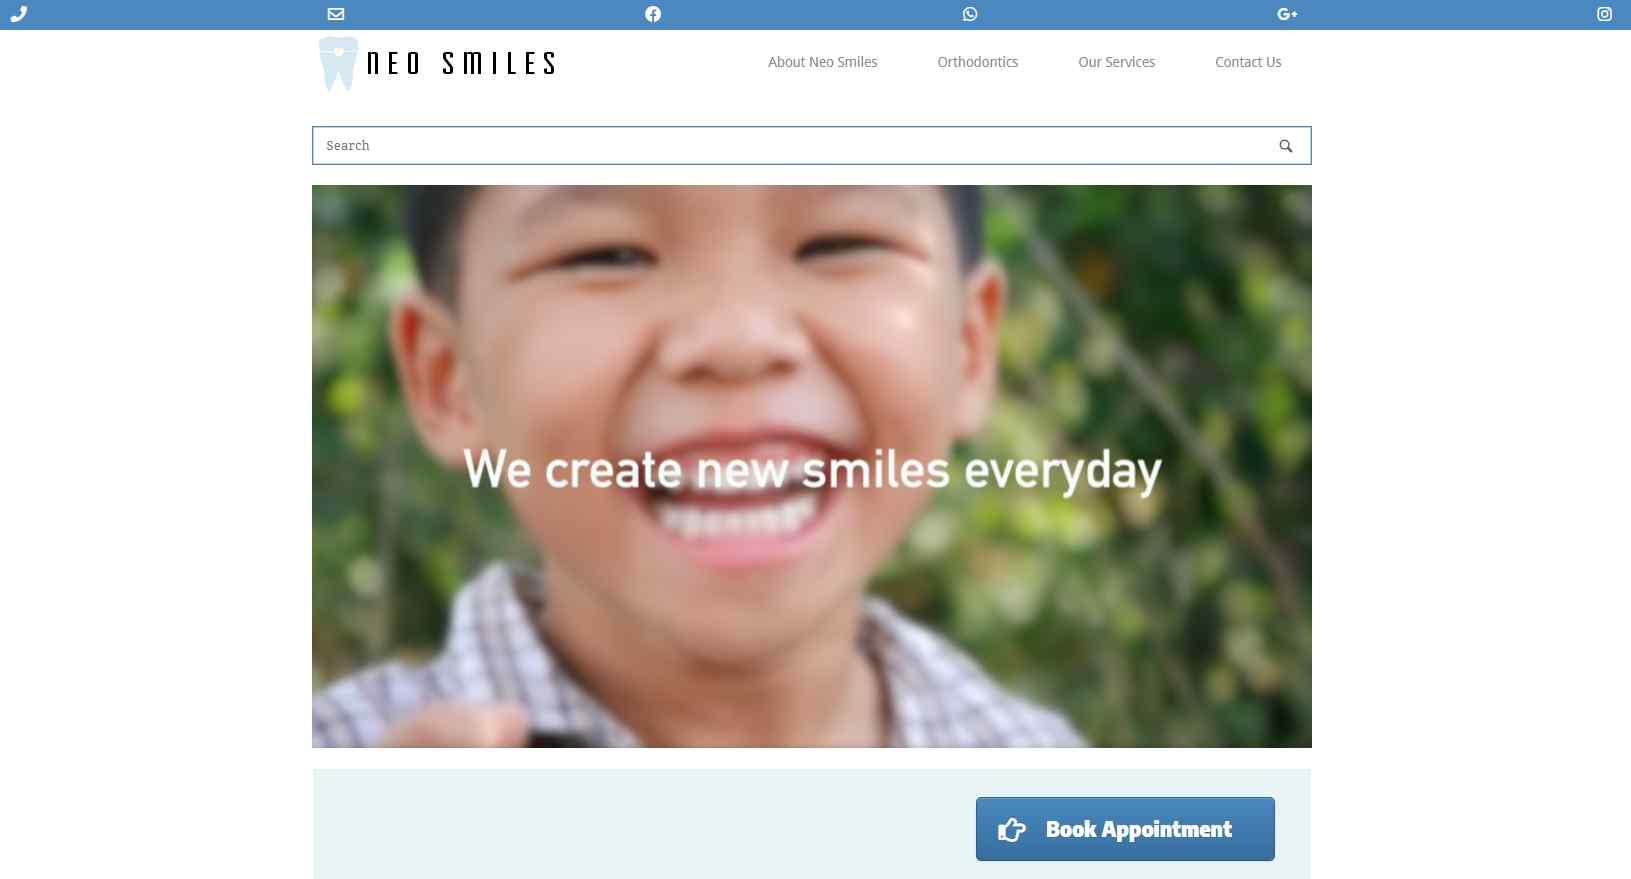 neo smiles Top Orthodontics & Clinics Providing Invisalign In Singapore